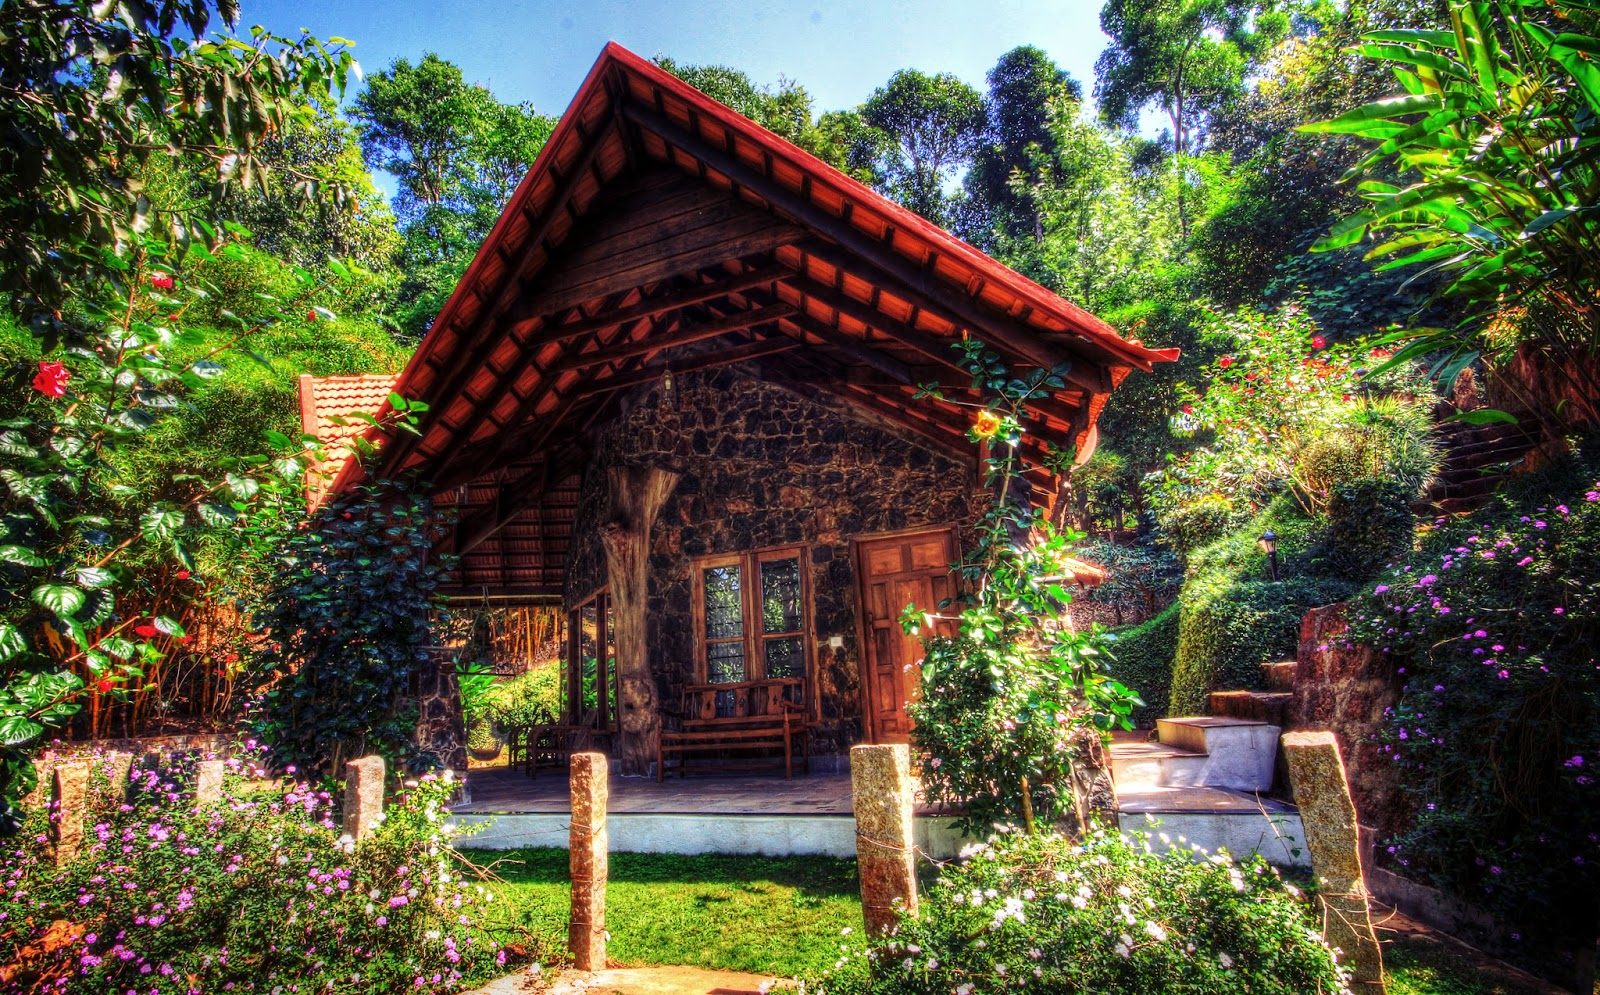 villa urvinkhan,chikmagalur,travel BLog,BAngalore